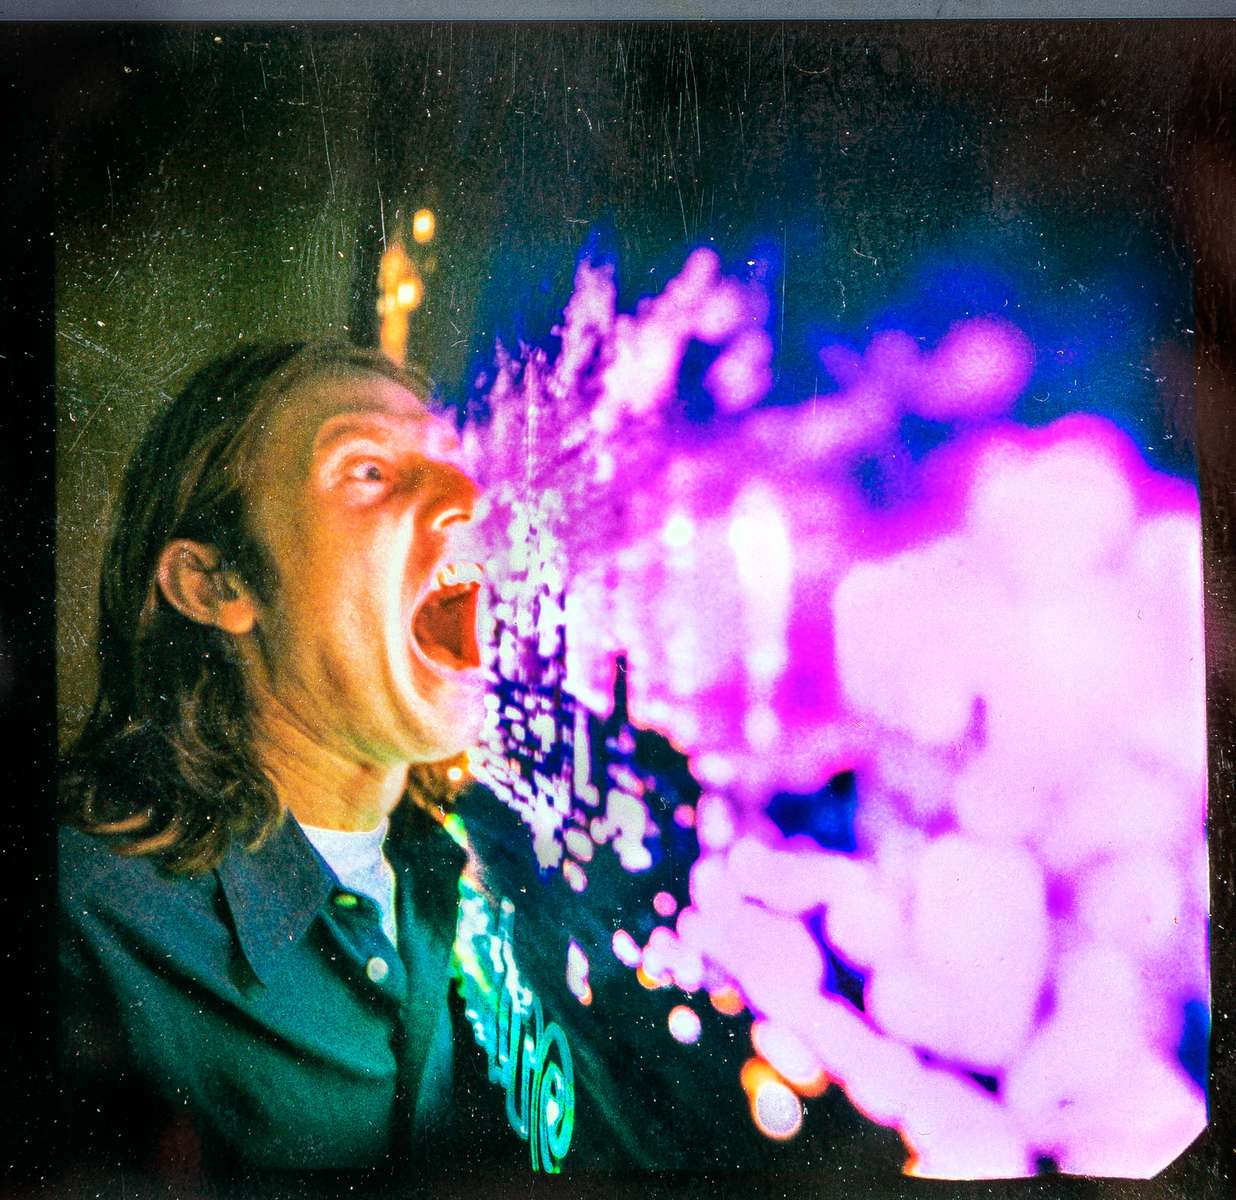 assistant_polaroid-polaroid_chris_magenta-breath-_FV_9337-HDR-frank_veronsky_frank_veronsky